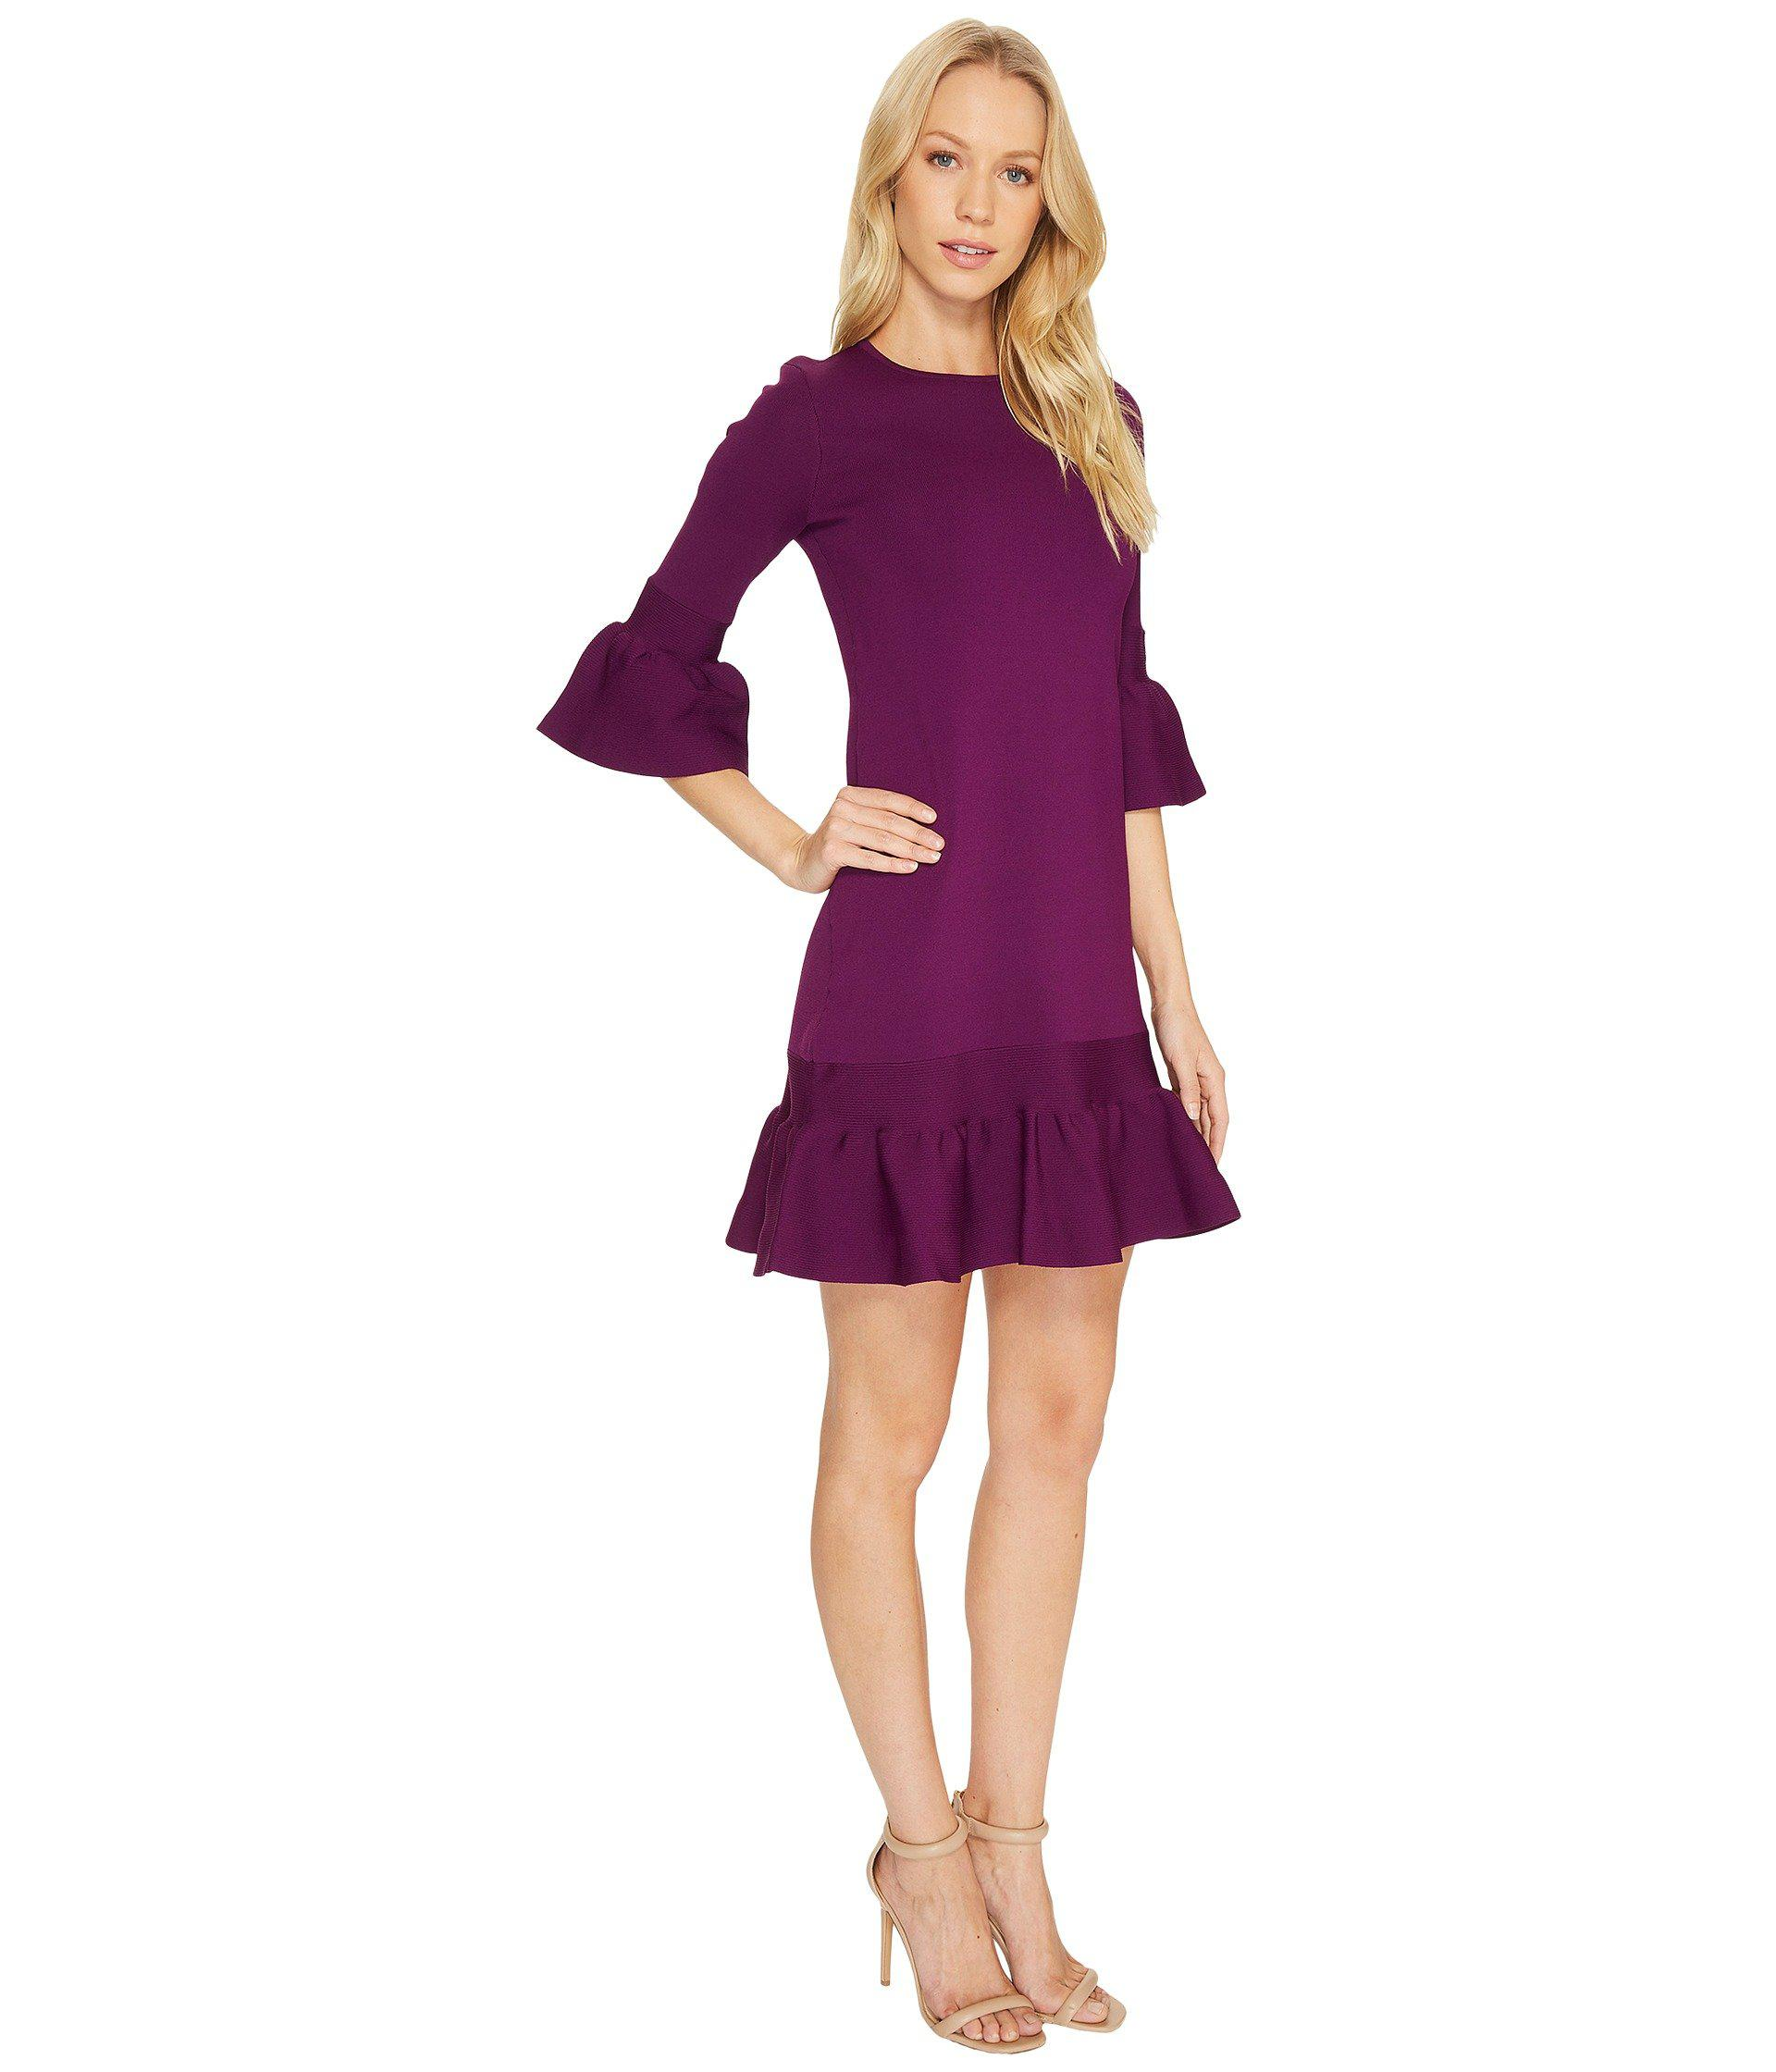 c7327c91c717 Lyst - Ted Baker Tynia Peplum Sleeve Knitted Dress in Purple